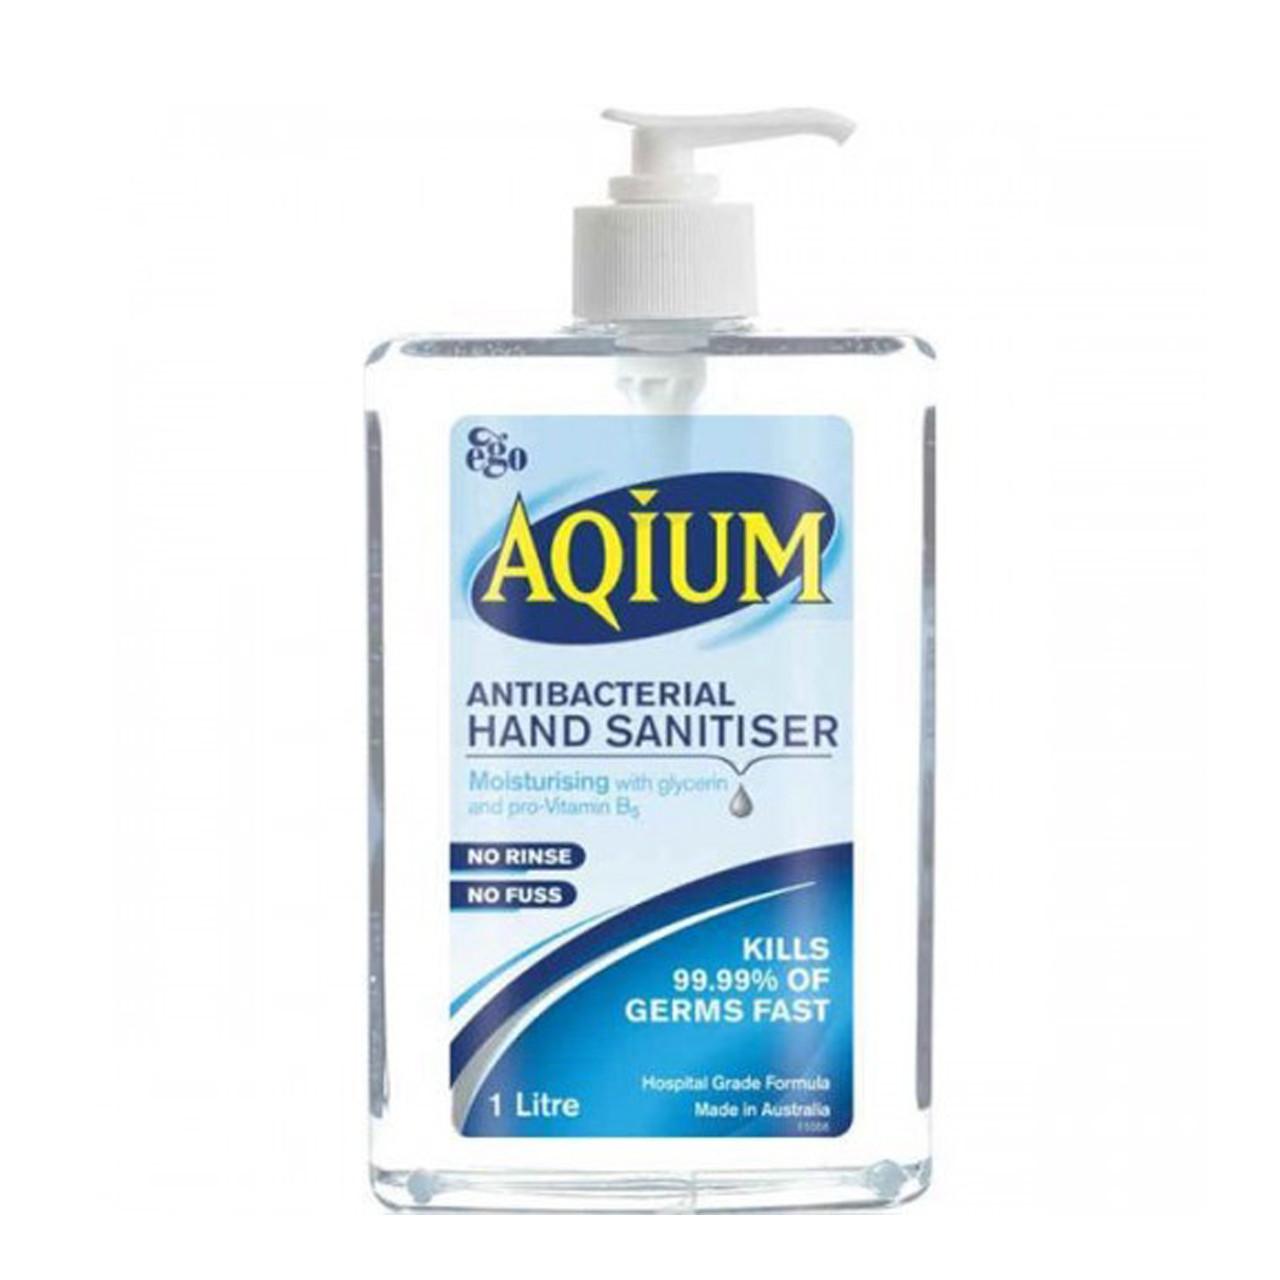 Aqium Hand Sanitiser